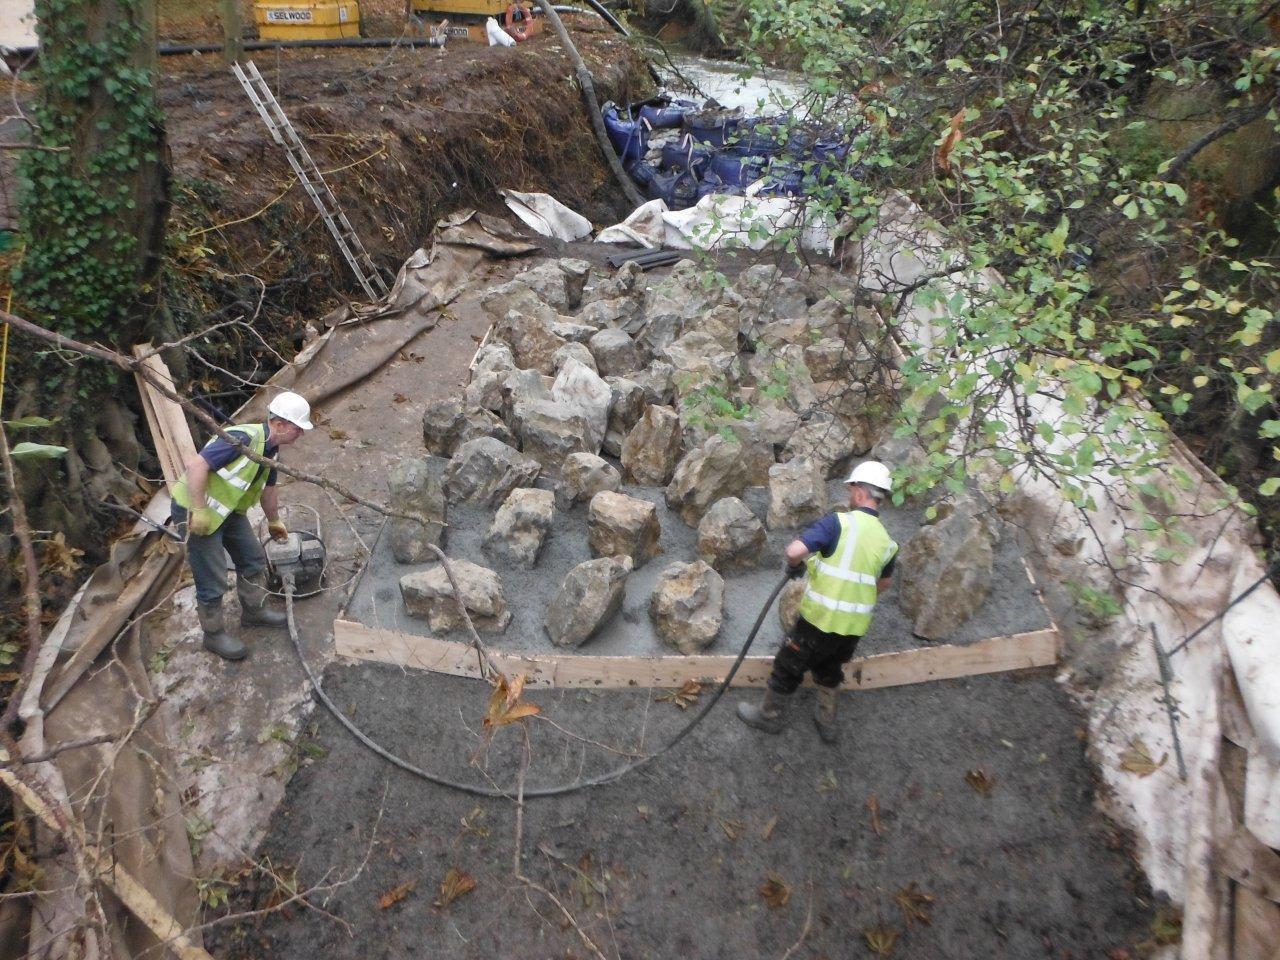 Fixing the Rocks with Concrete Sharpsbridge